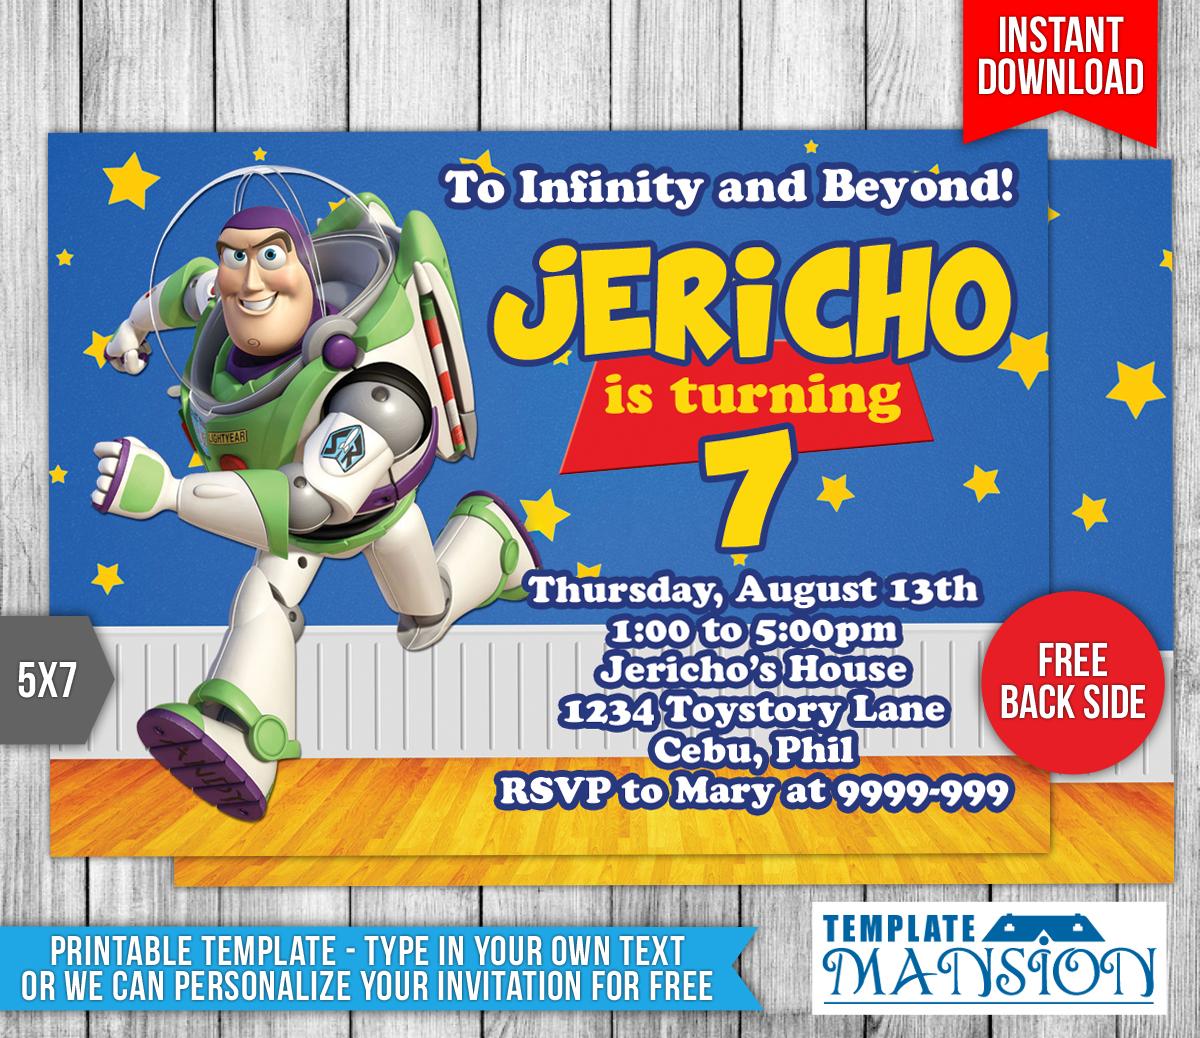 Buzz Lightyear Toy Story Birthday Invitation By Templatemansion